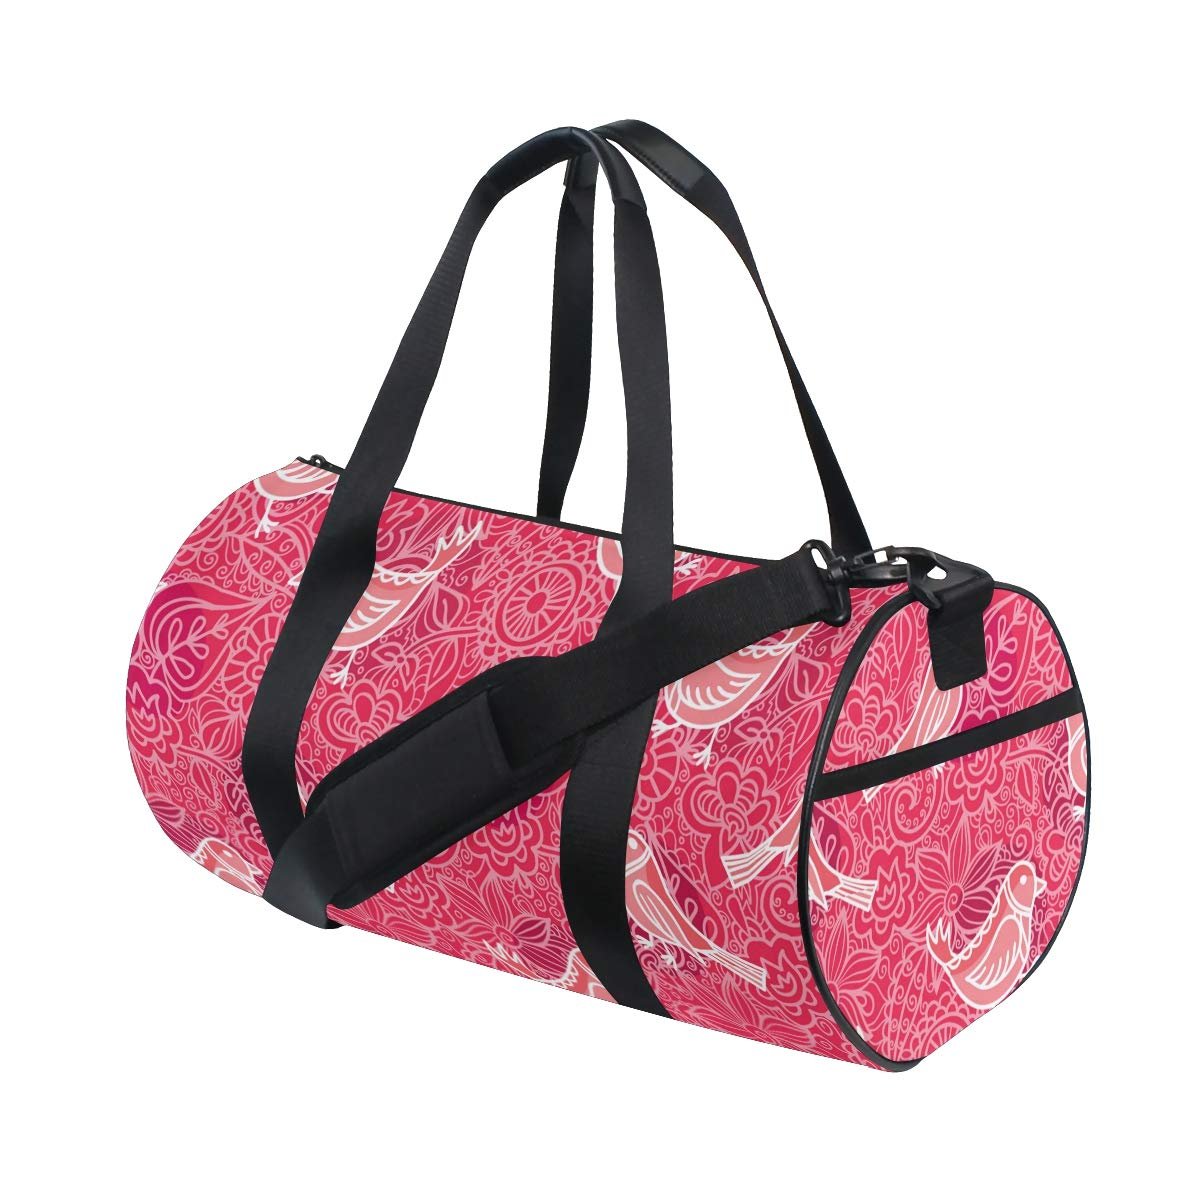 Waterproof Non-Slip Wearable Crossbody Bag fitness bag Shoulder Bag Dry Fruits Picture